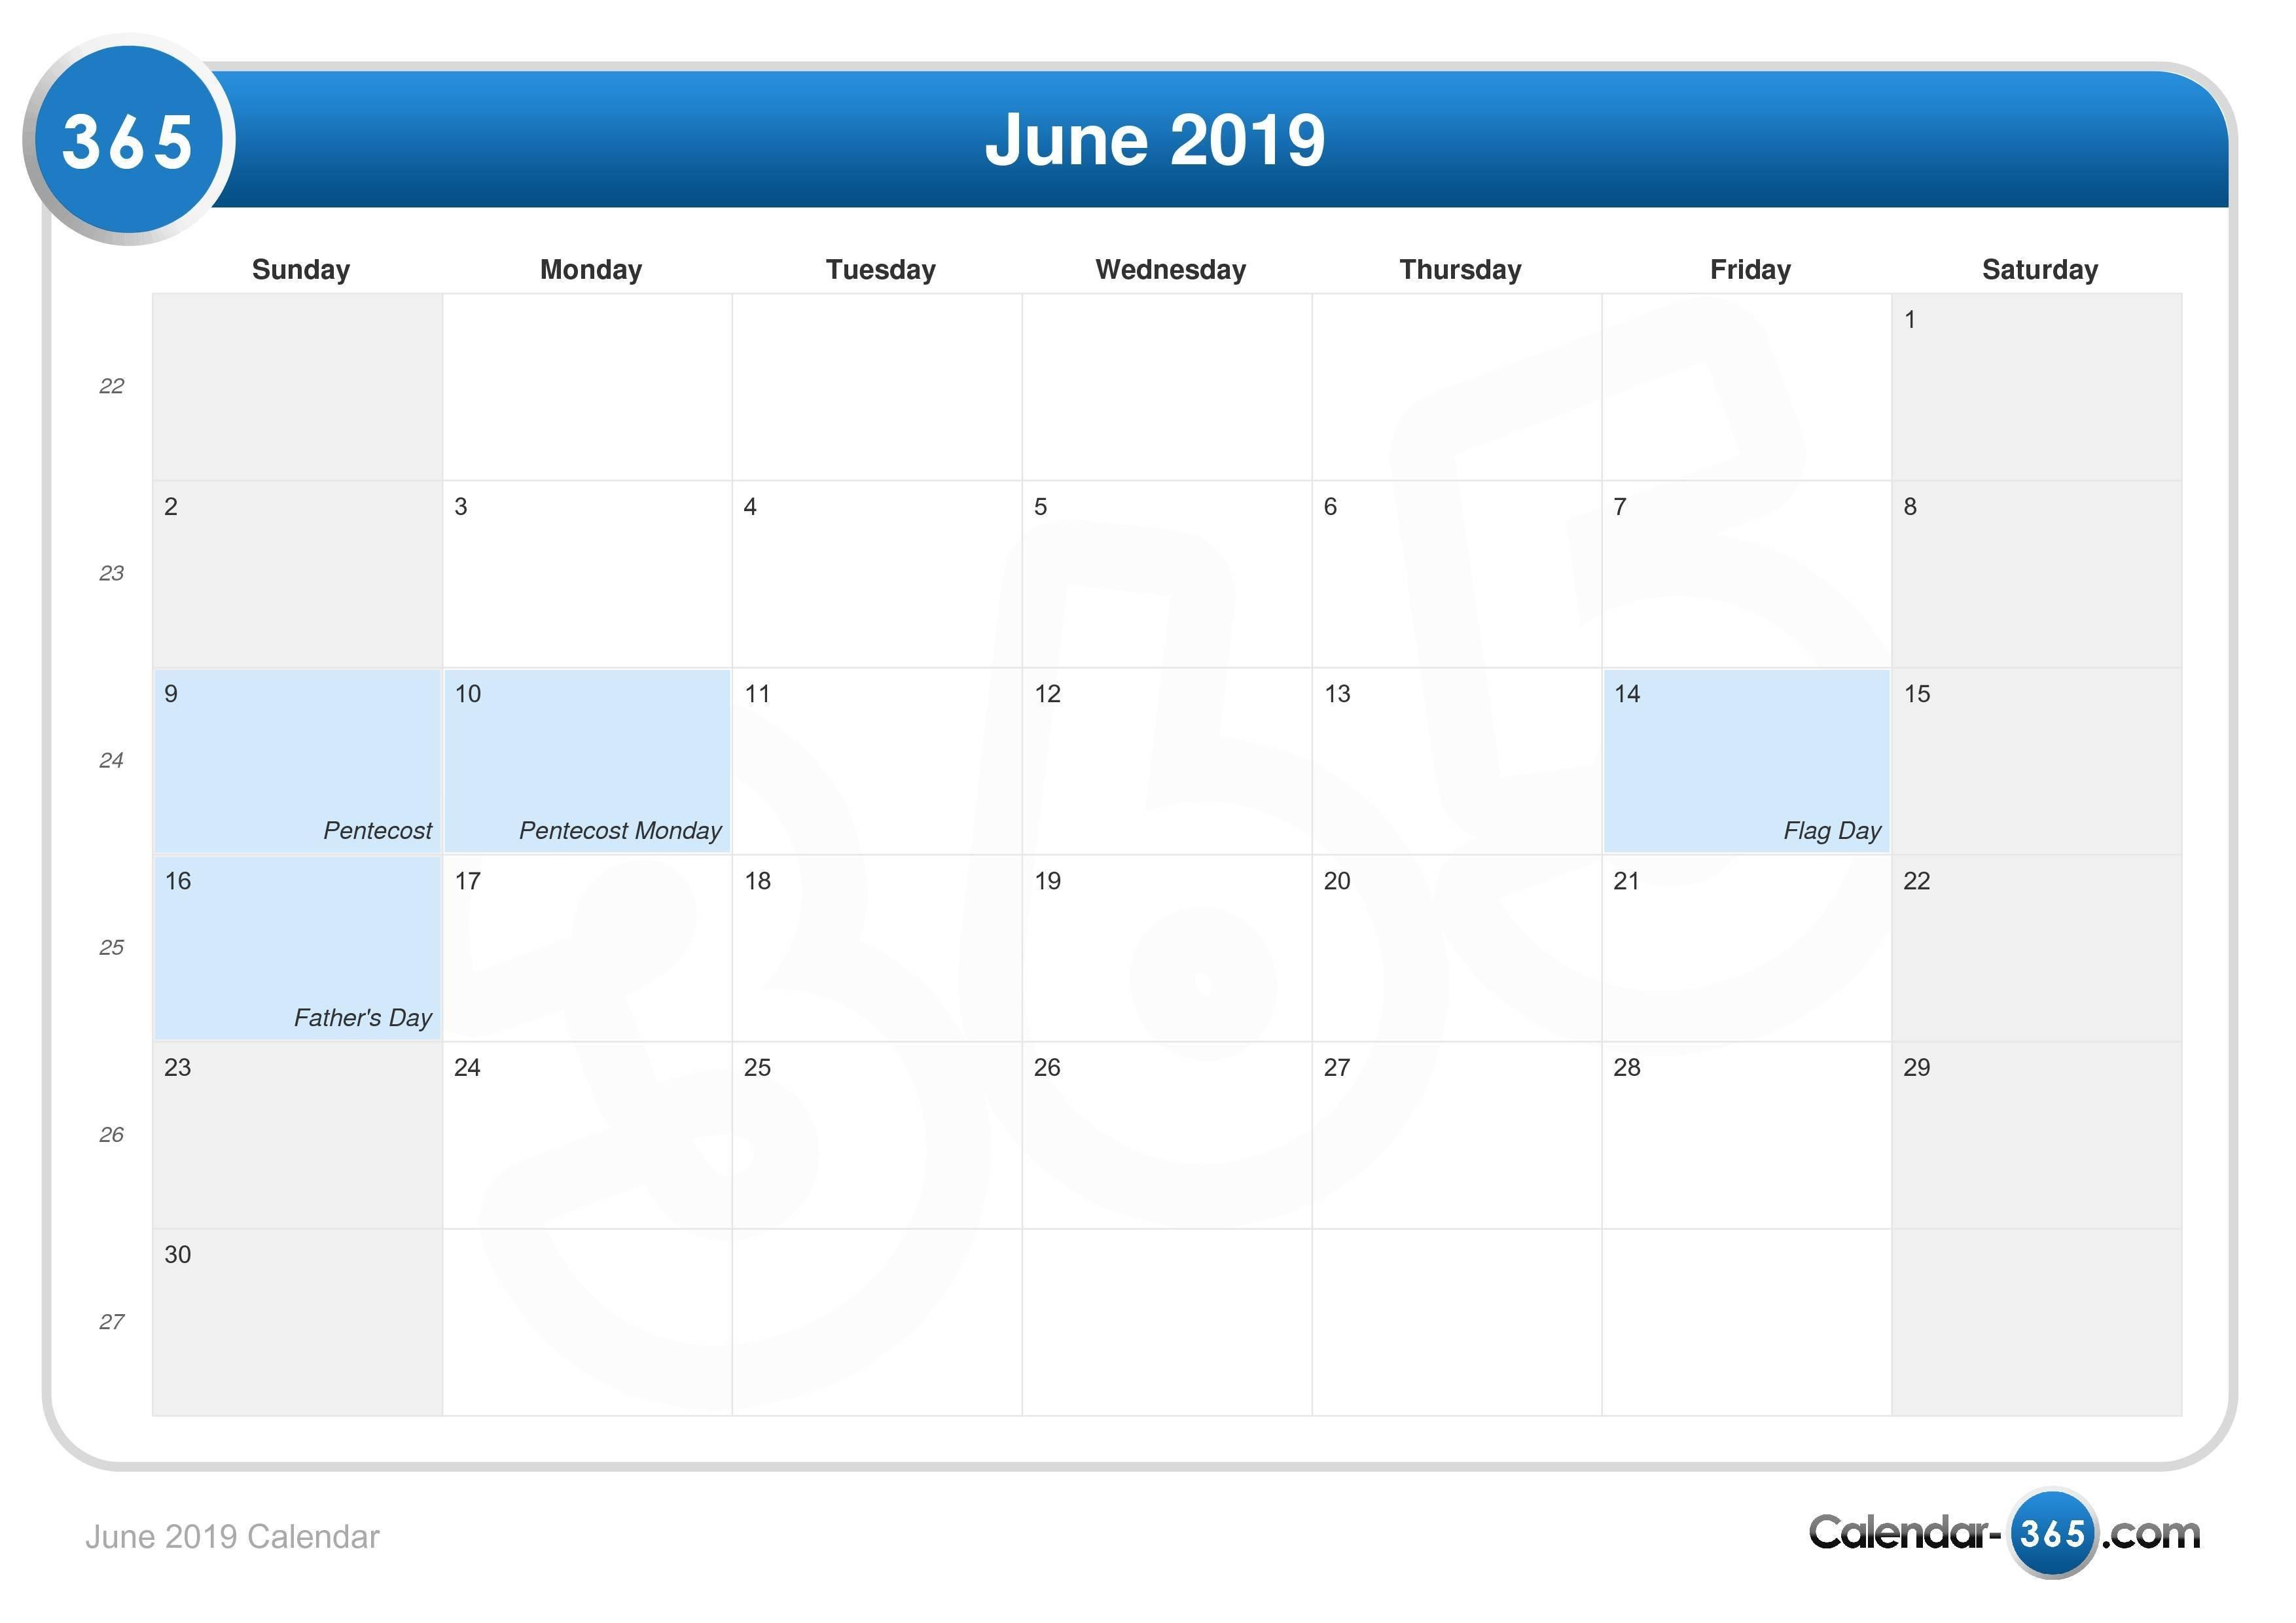 June 2019 Calendar June 2 2019 Calendar